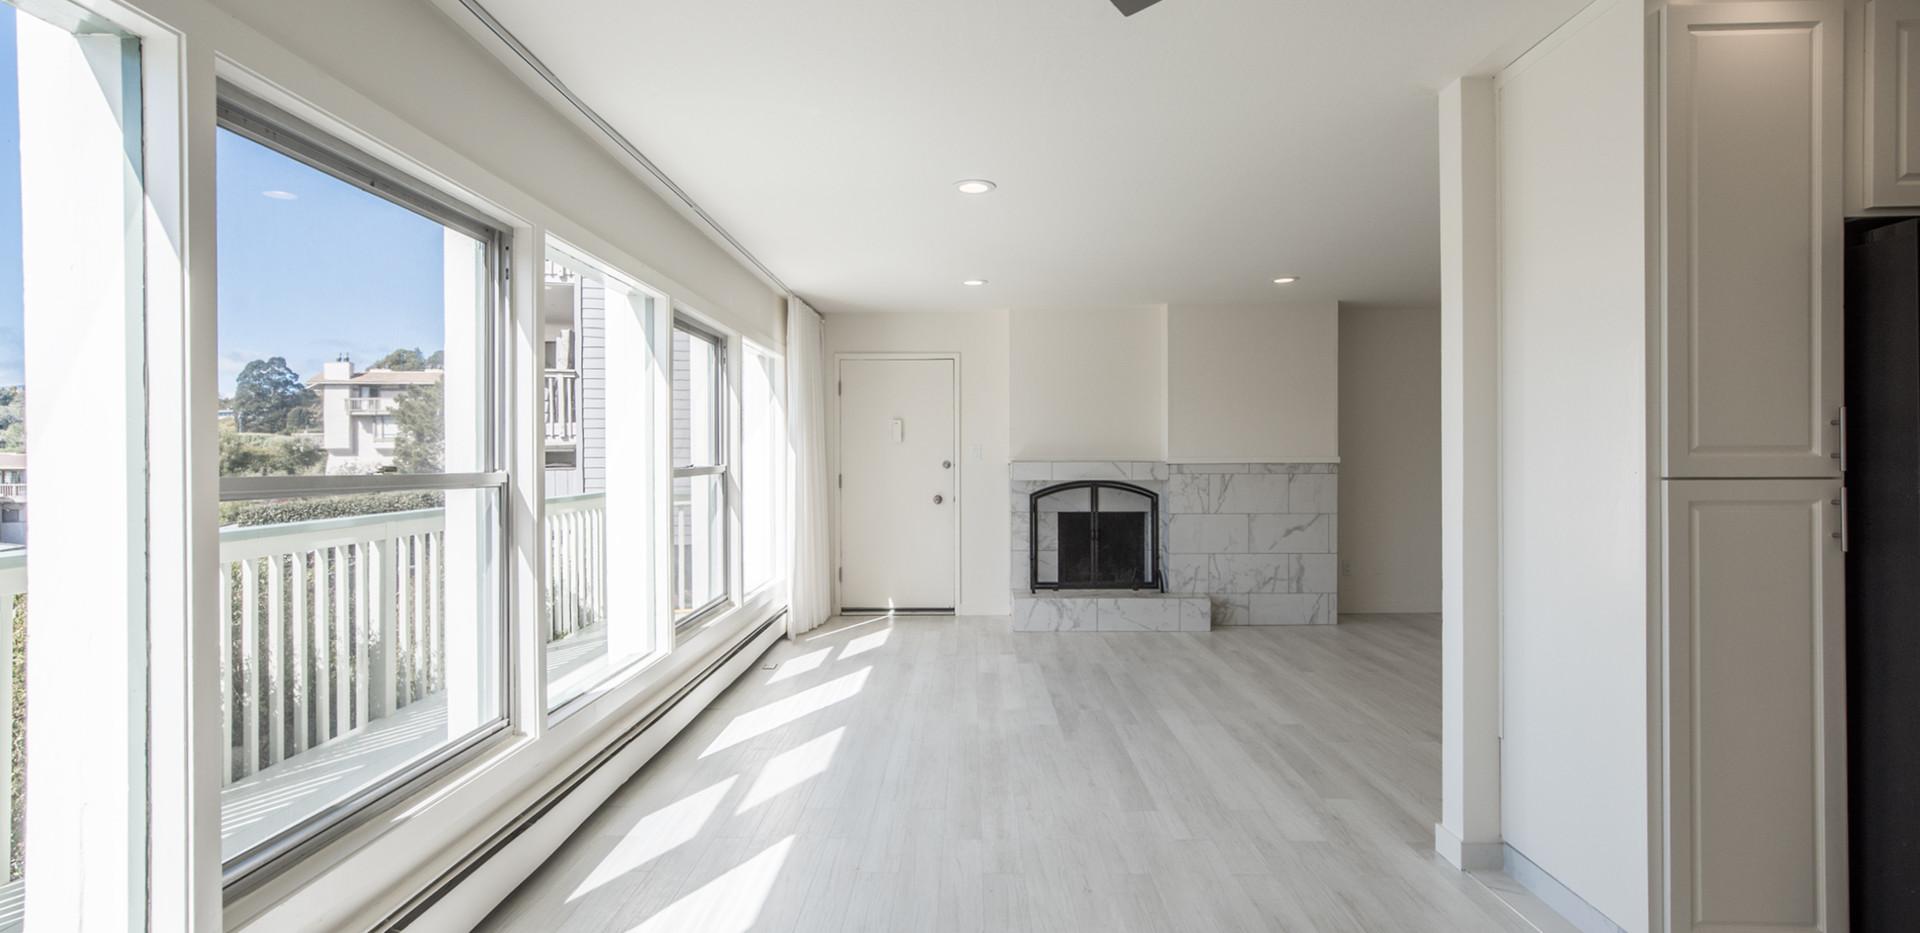 Marinero 105 Living Room 1.jpg